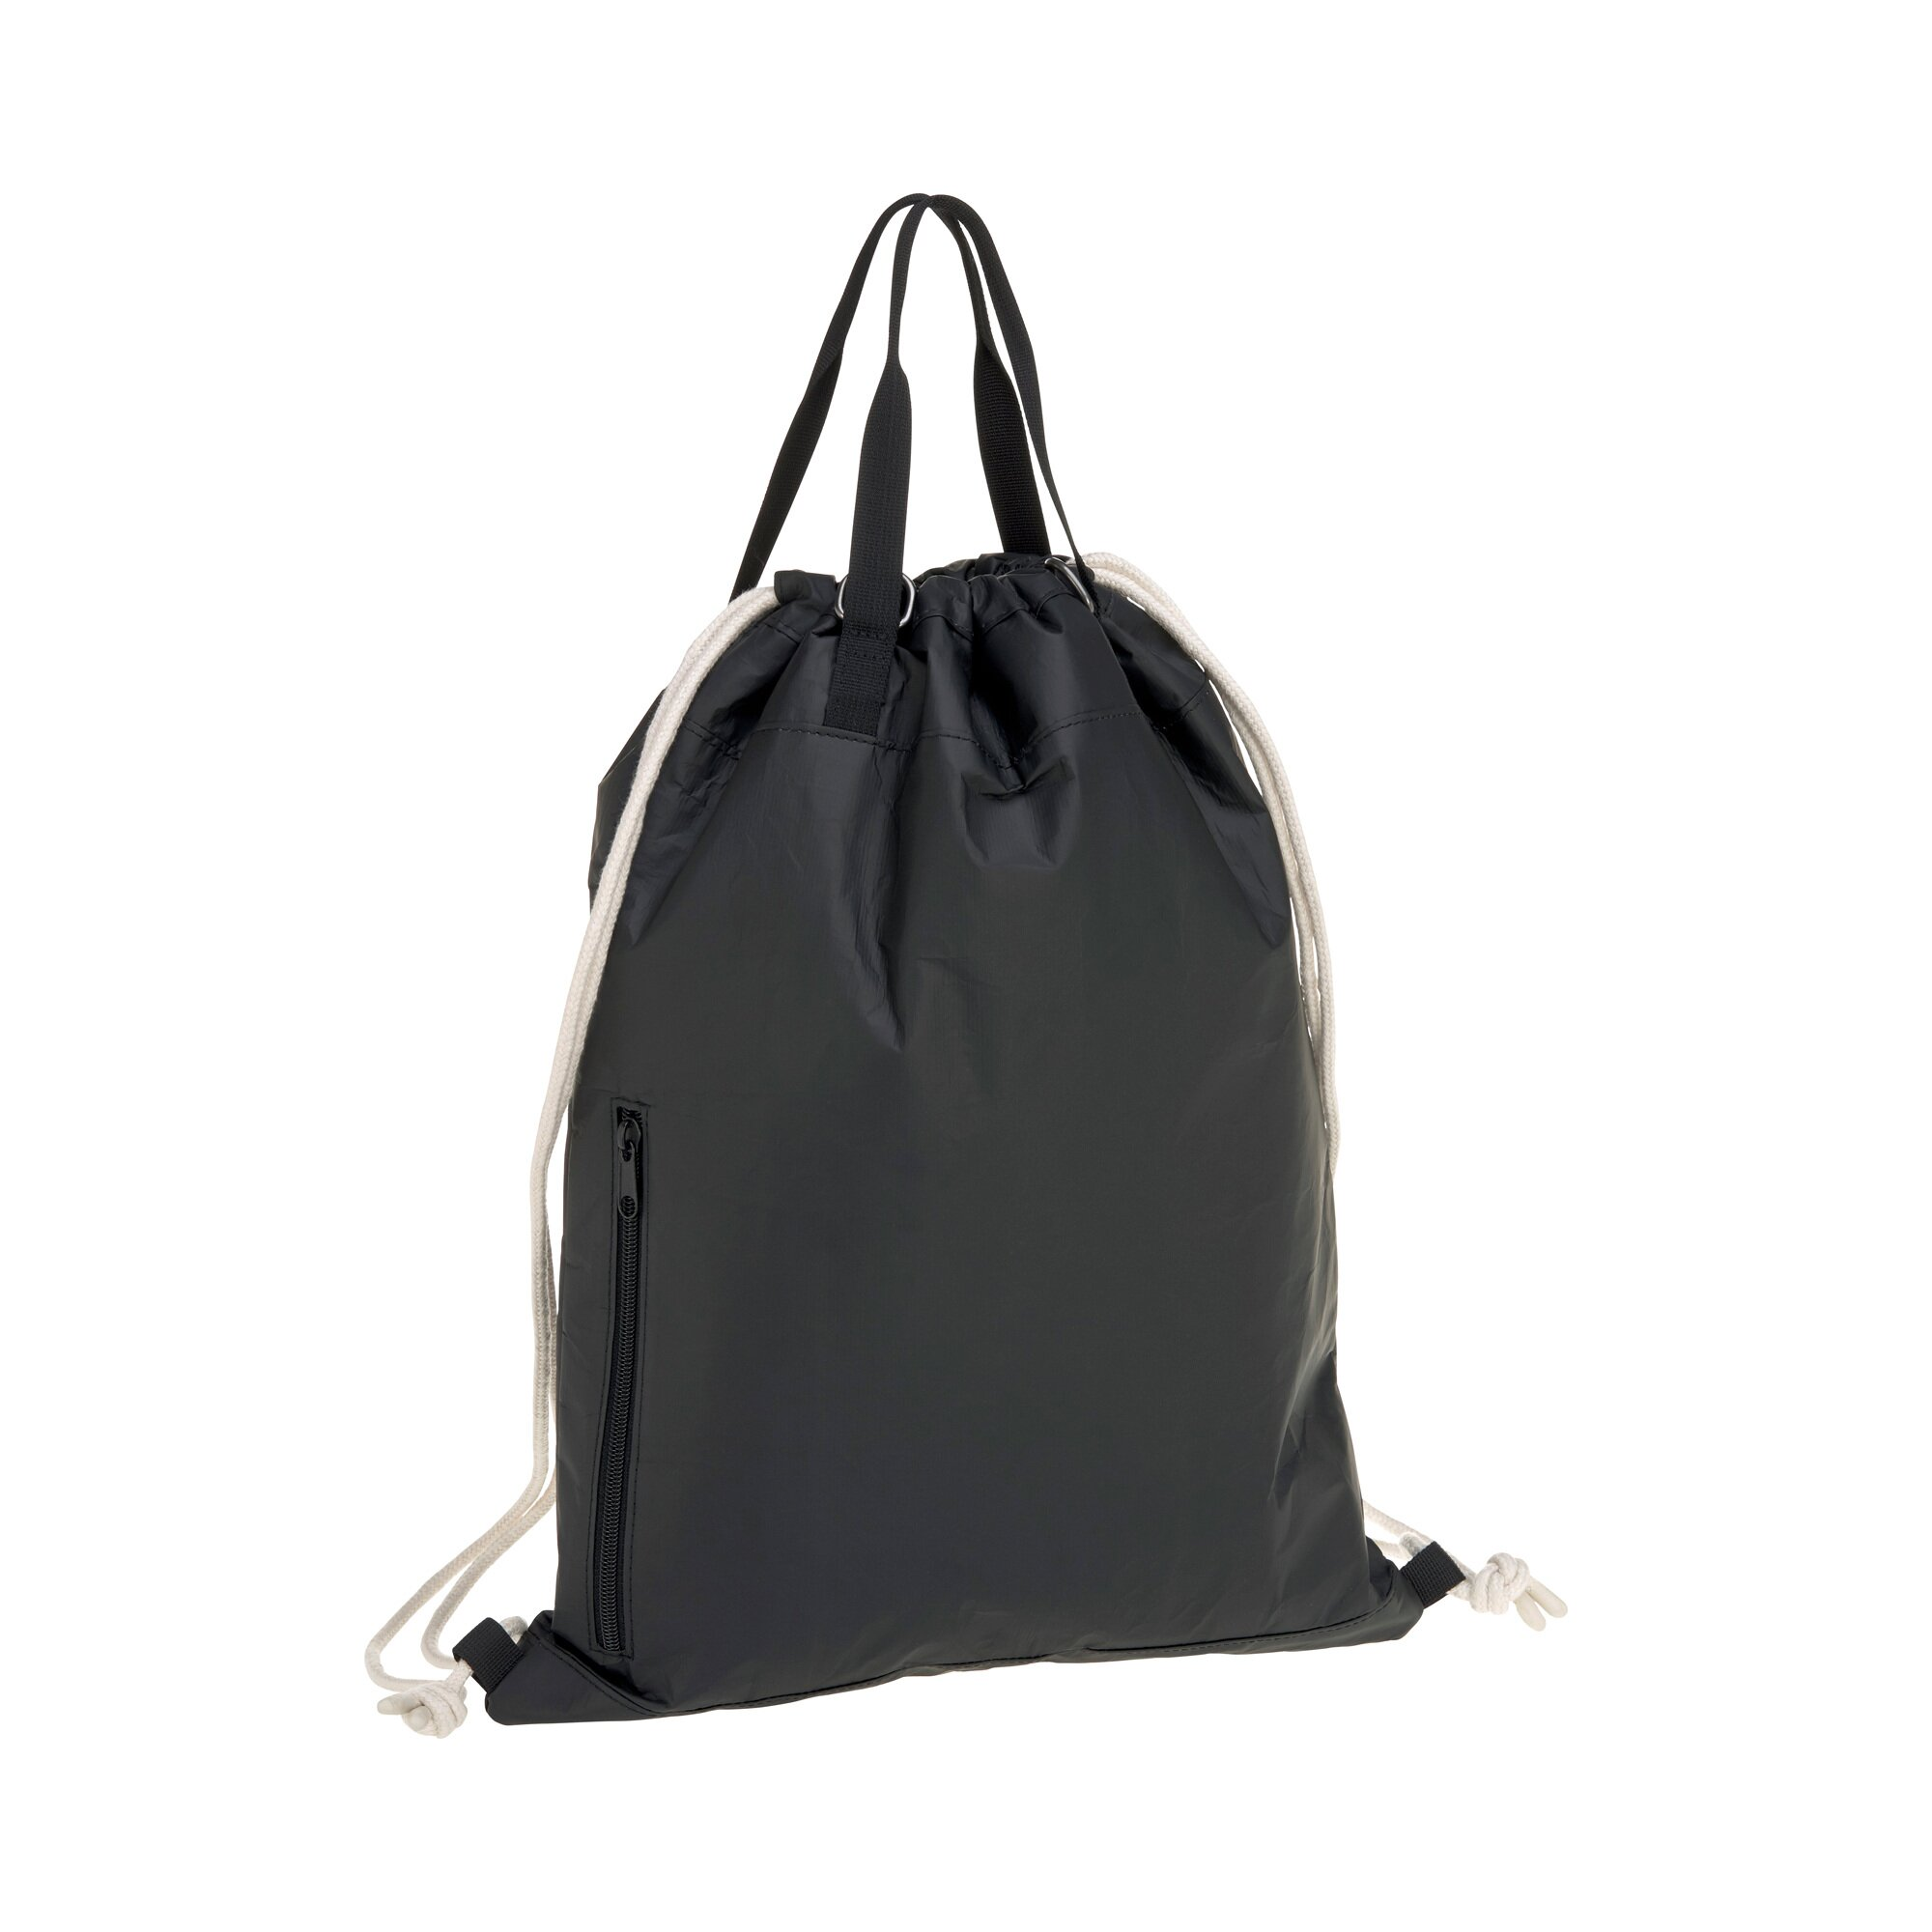 green-label-wickelrucksack-tyve-string-bag-schwarz